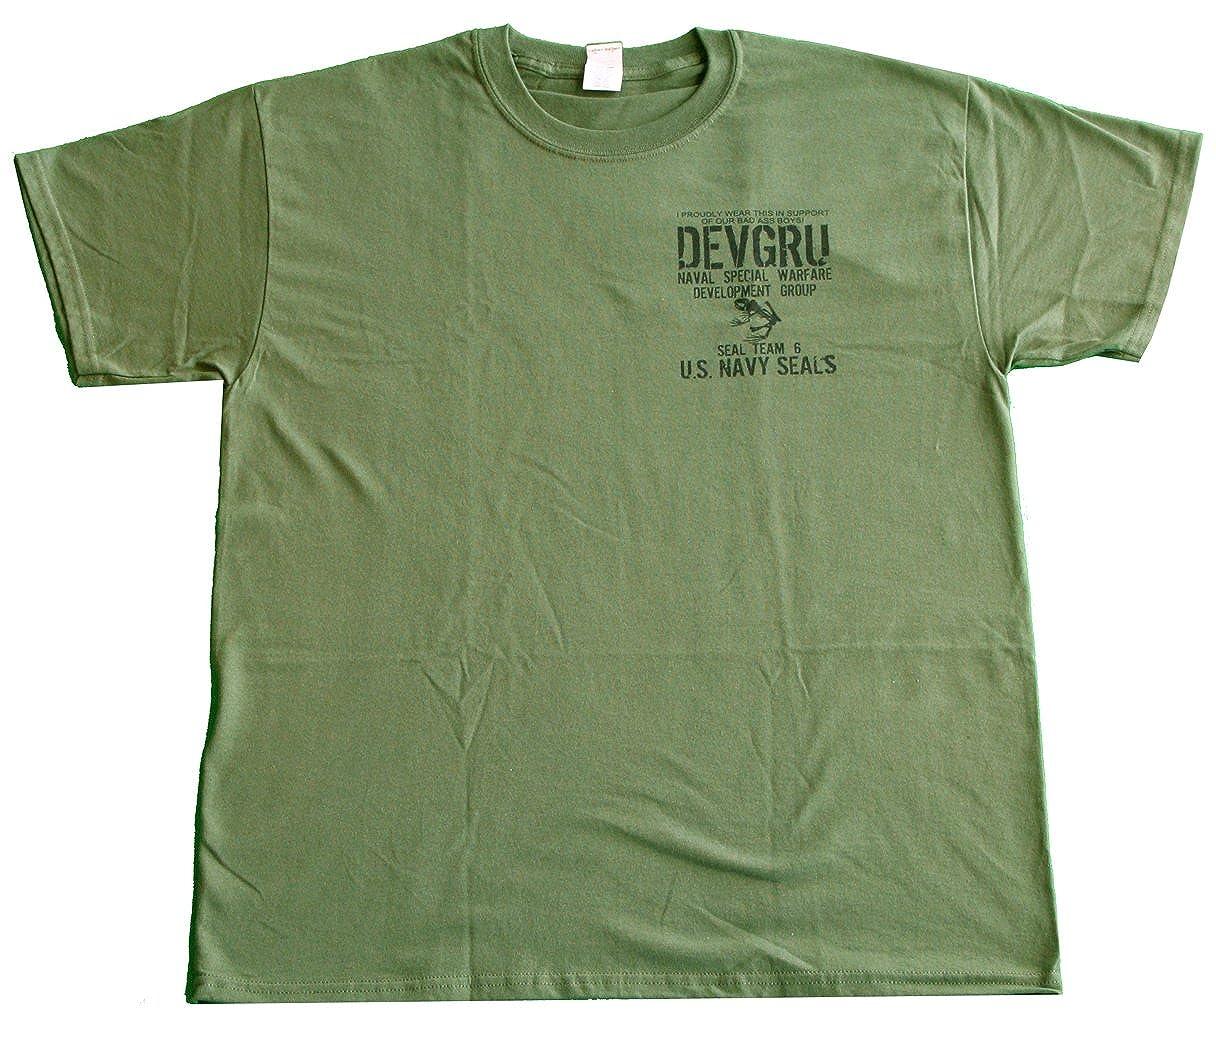 87bcdea32fd U. S.Navy Seals Skull Skeleton Devgru T-Shirt United States Naval Special  Warfare